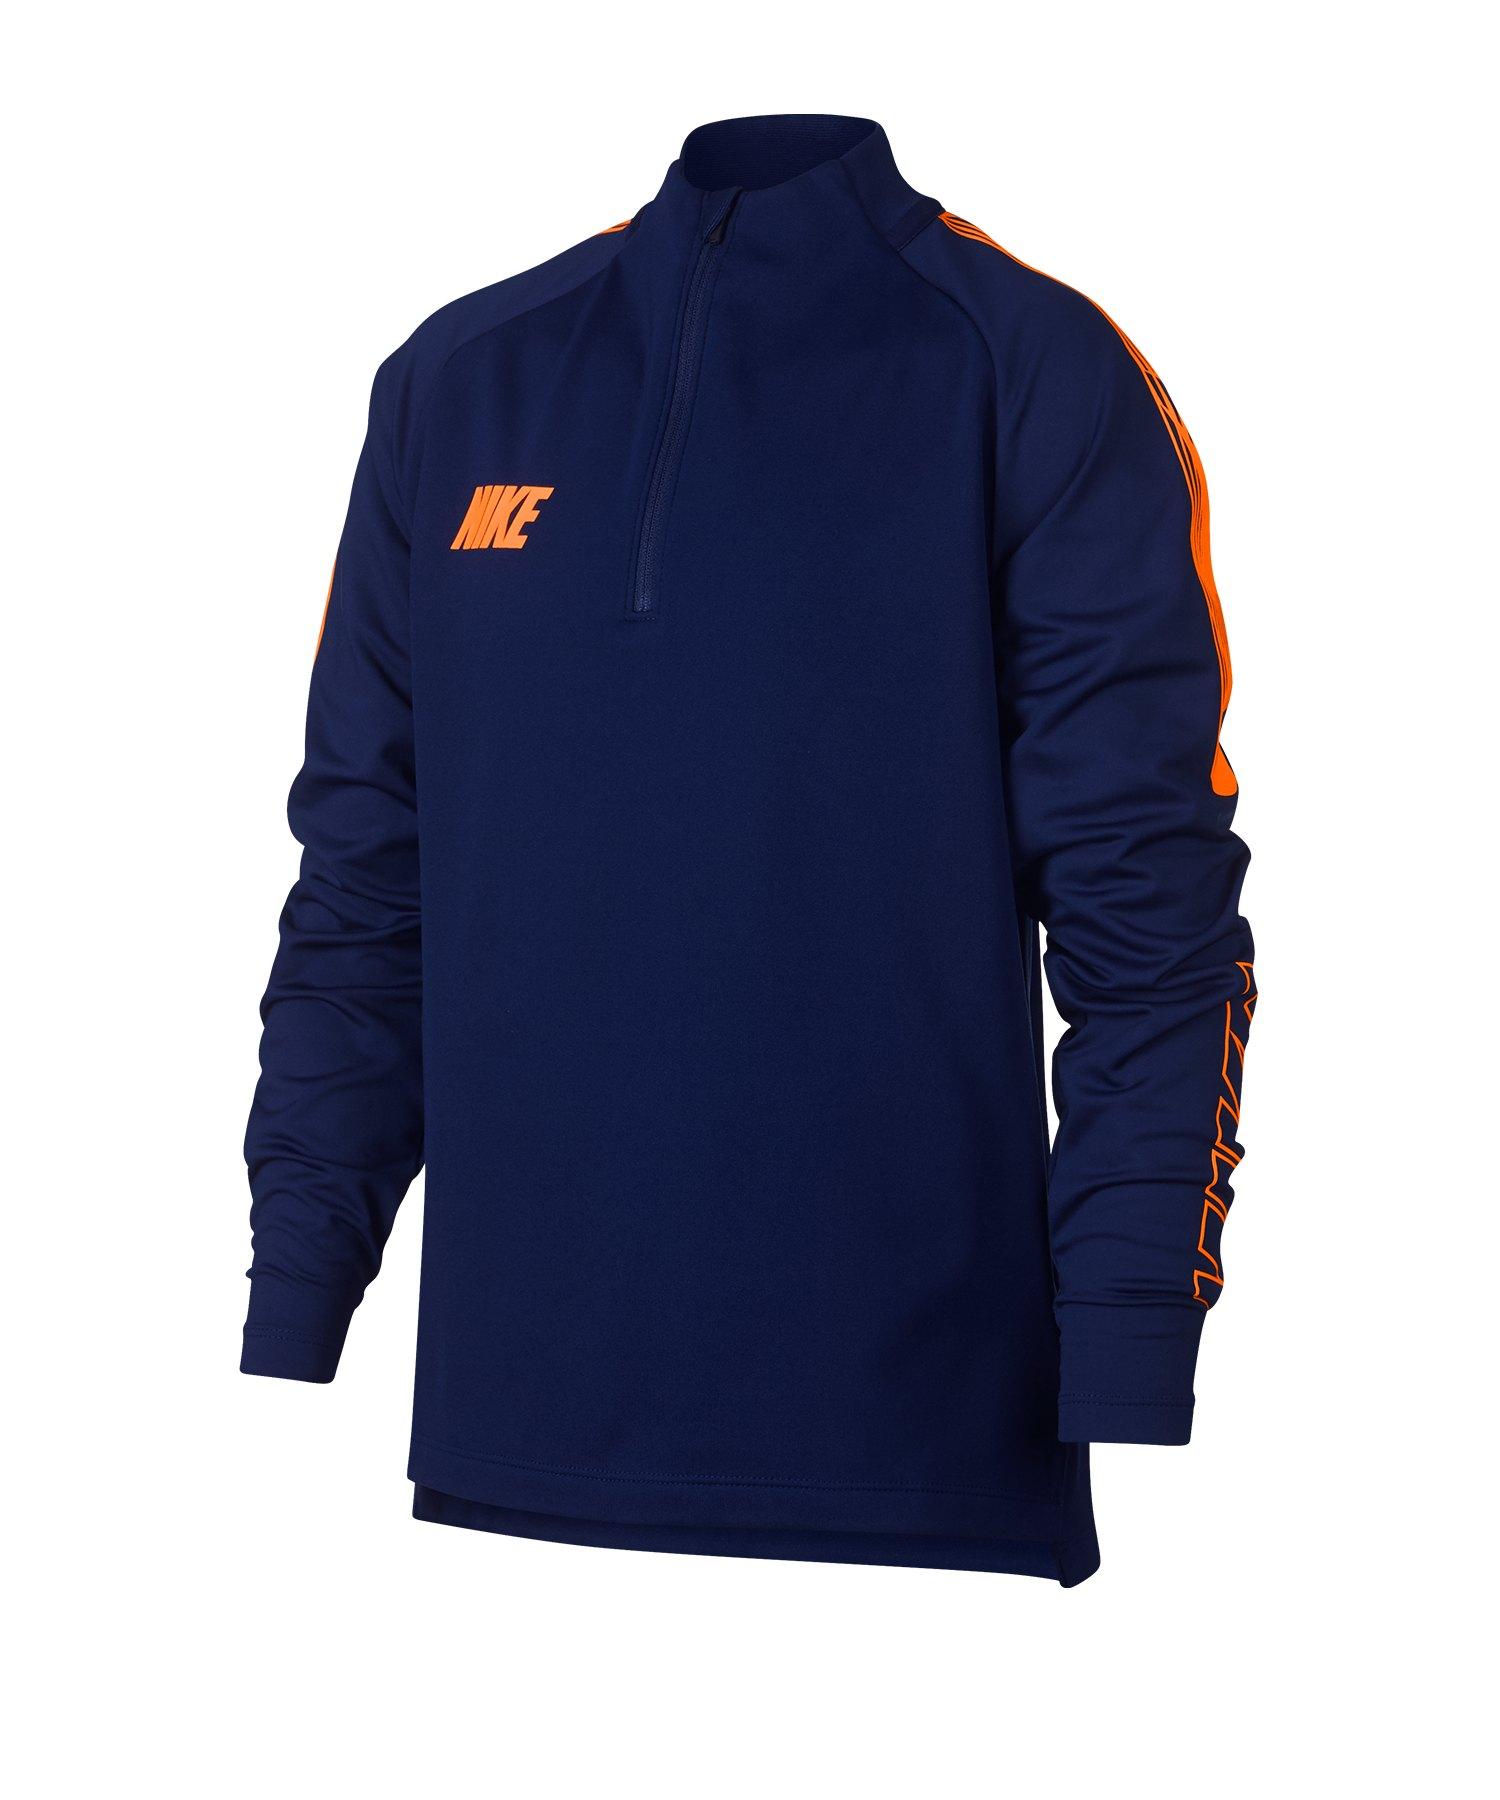 Nike Dry Squad Drill Top Sweatshirt Kids Blau F492 - Blau